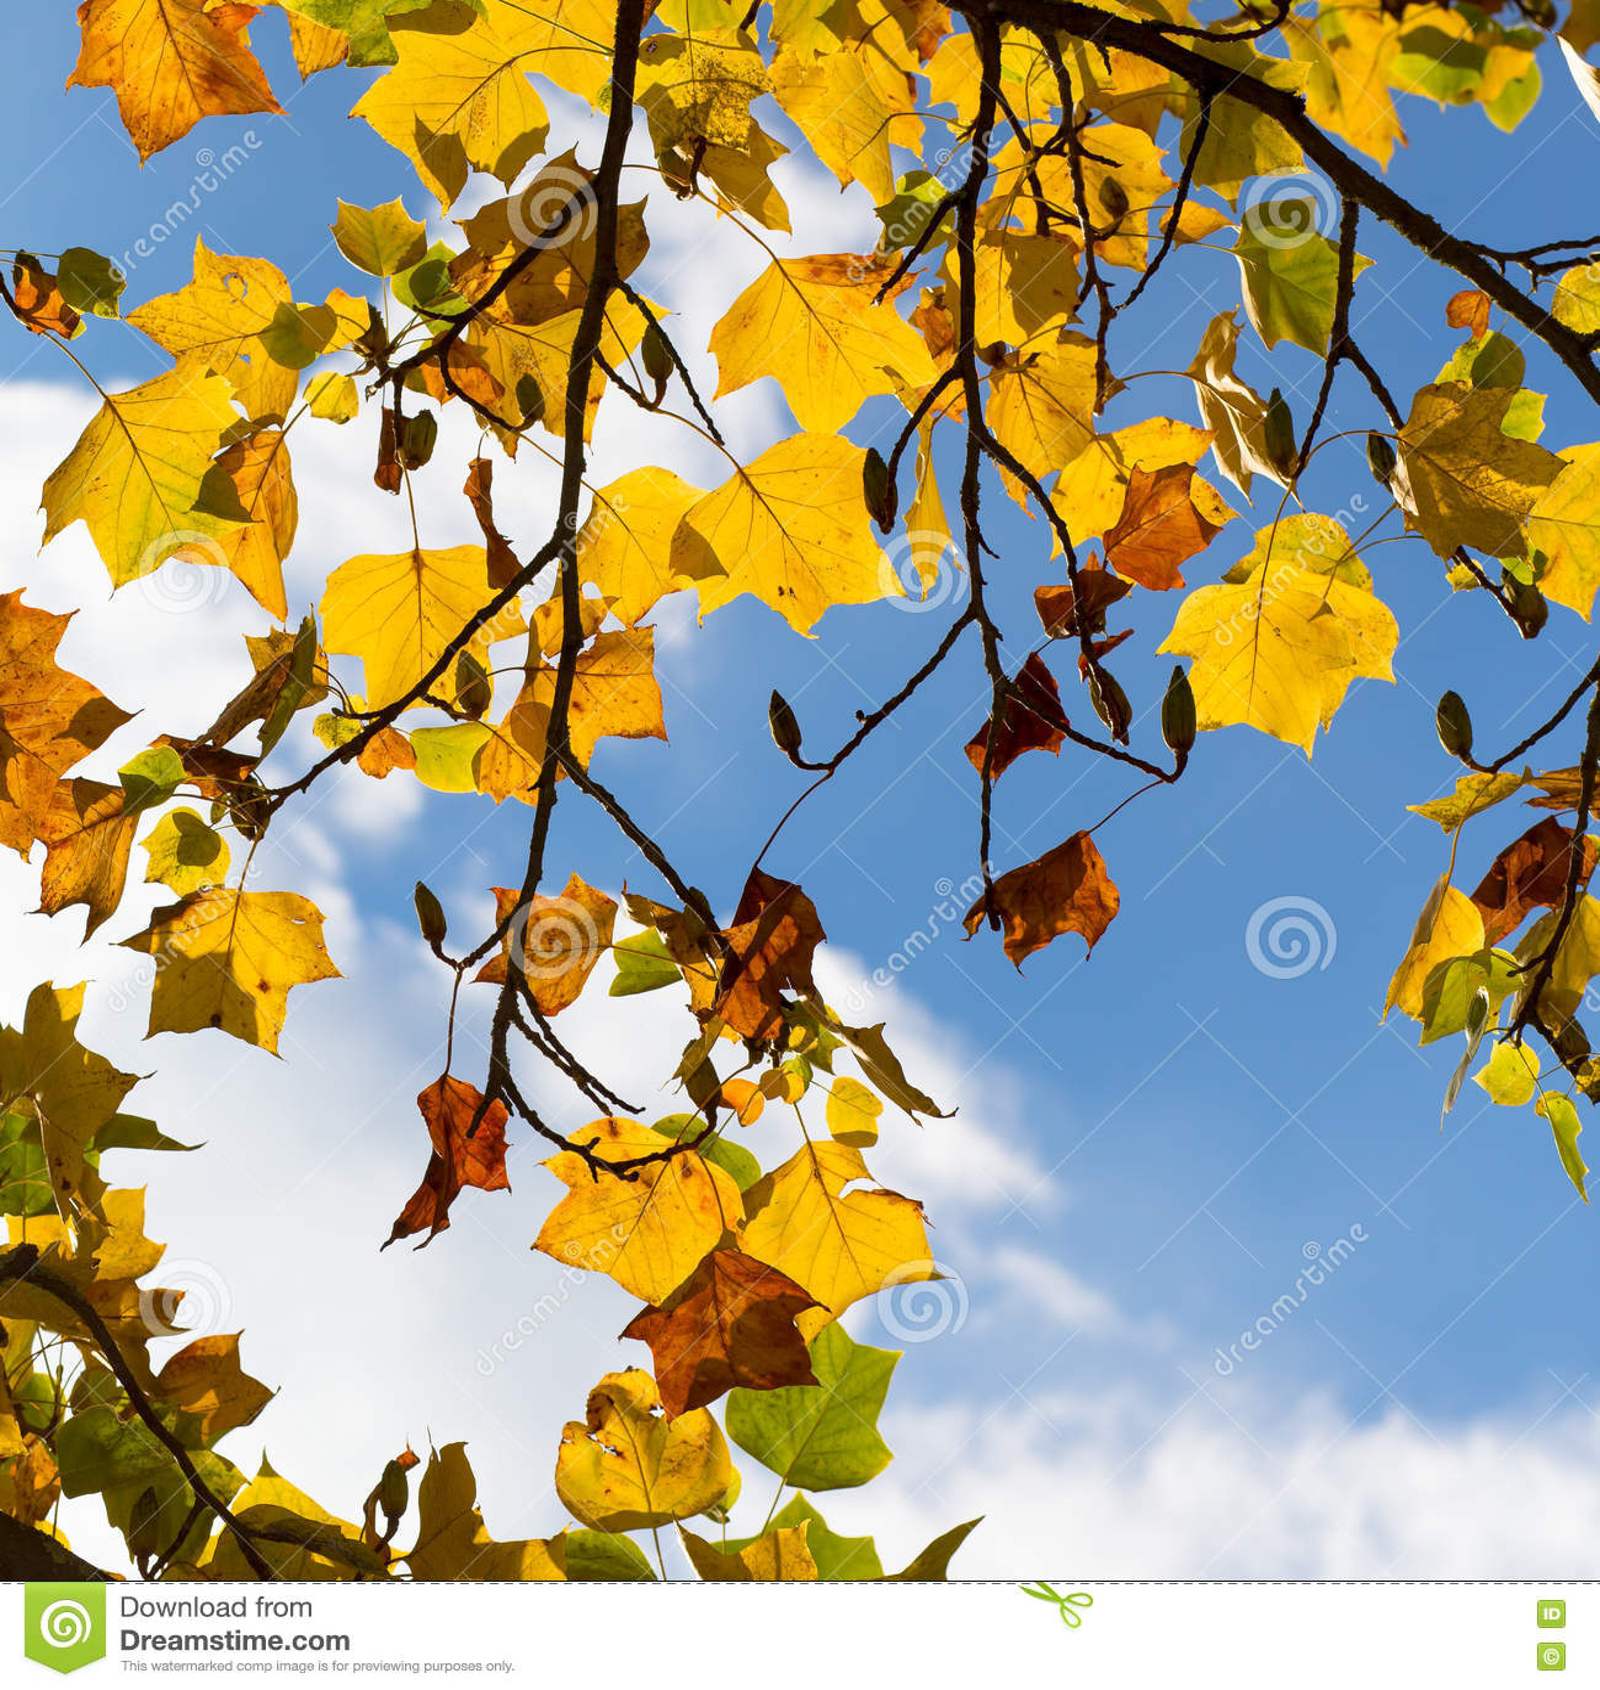 American Yellow Poplar Wood Shutters: Colorful Autumn Leaves On American Tulip Poplar Tree